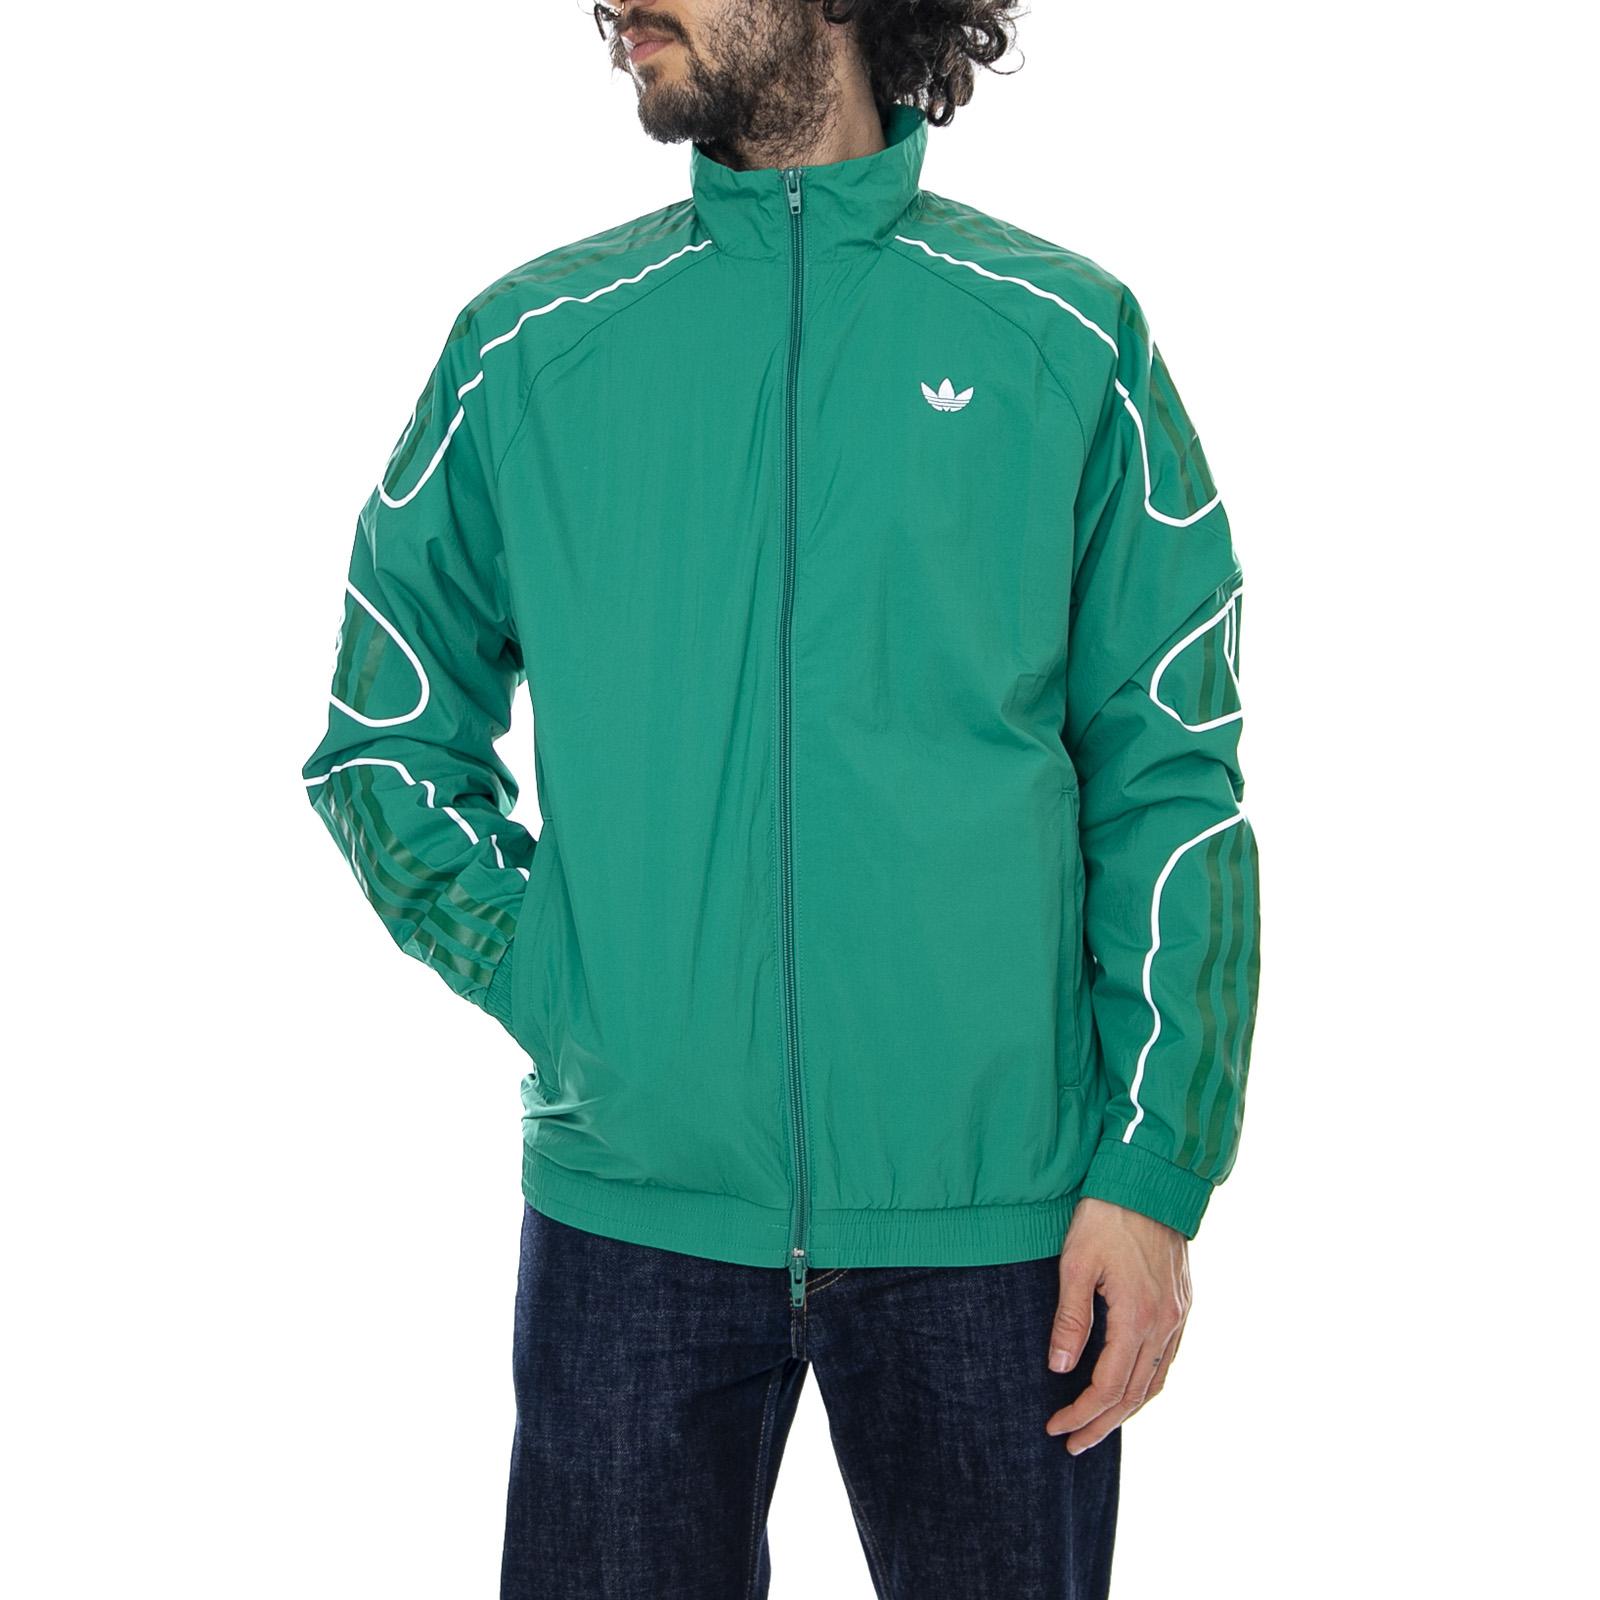 best cheap on feet images of great look Details about Adidas Flamestrike - Green - Mens Lightweight Jacket Green